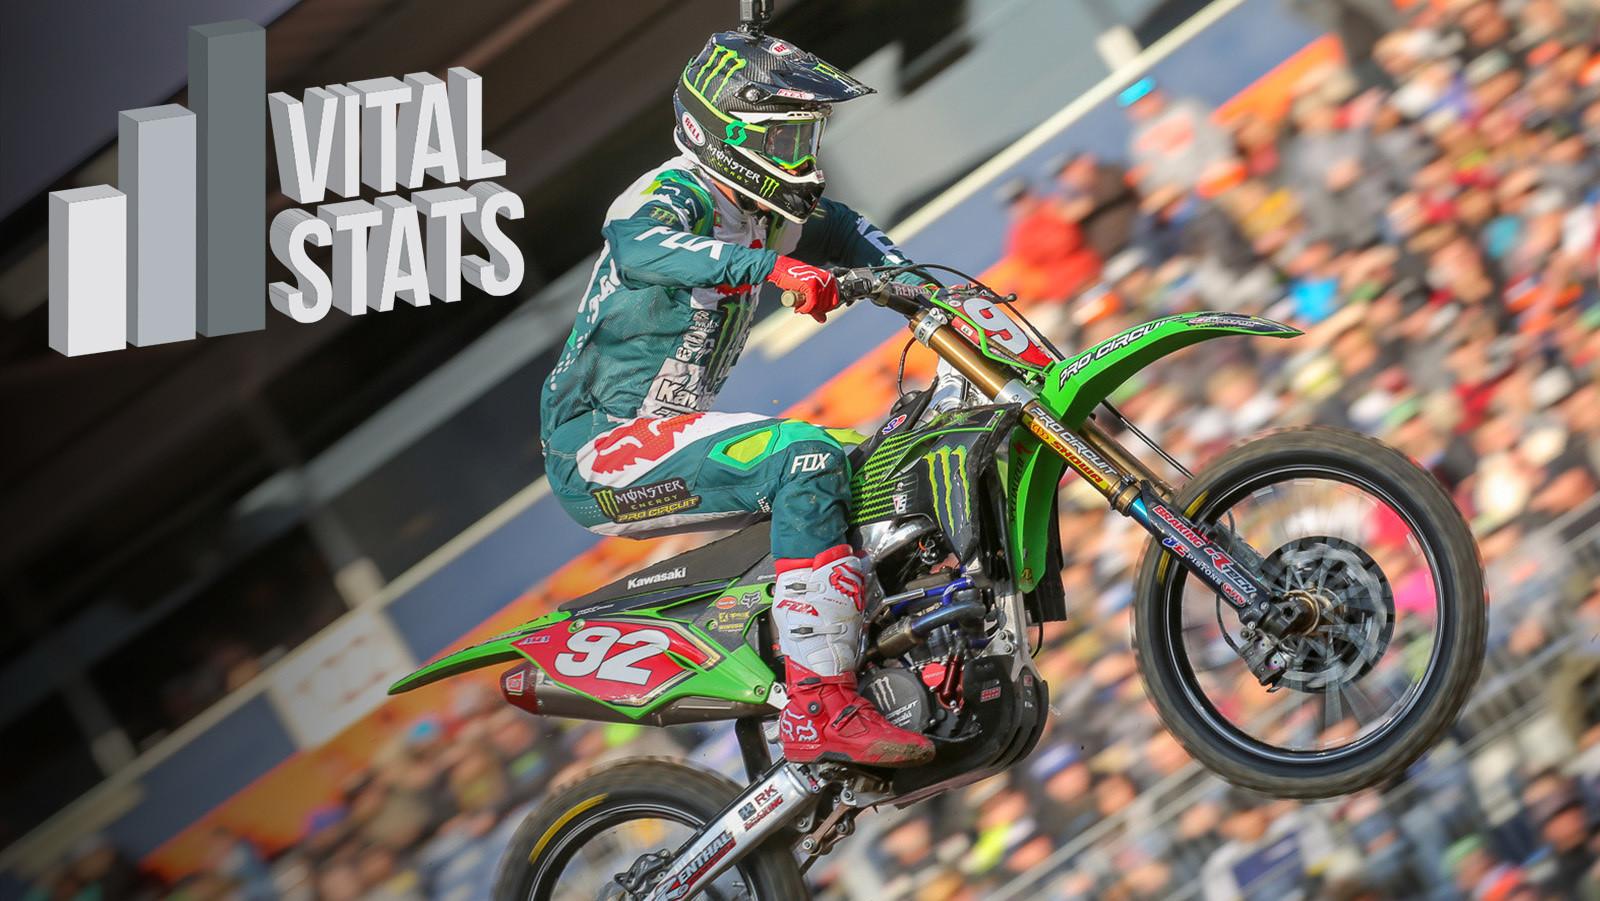 Vital Stats: 2019 Supercross Championship, Part 3